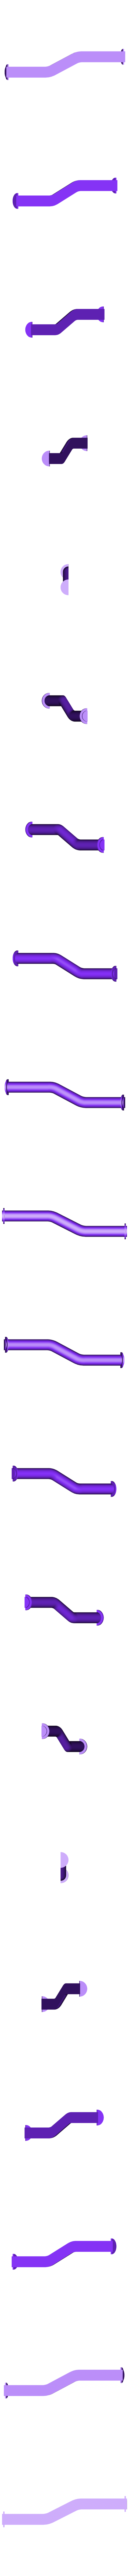 steam_pipe_bent-b.STL Download free STL file 4-8-8-4 Big Boy Locomotive • 3D printer object, RaymondDeLuca